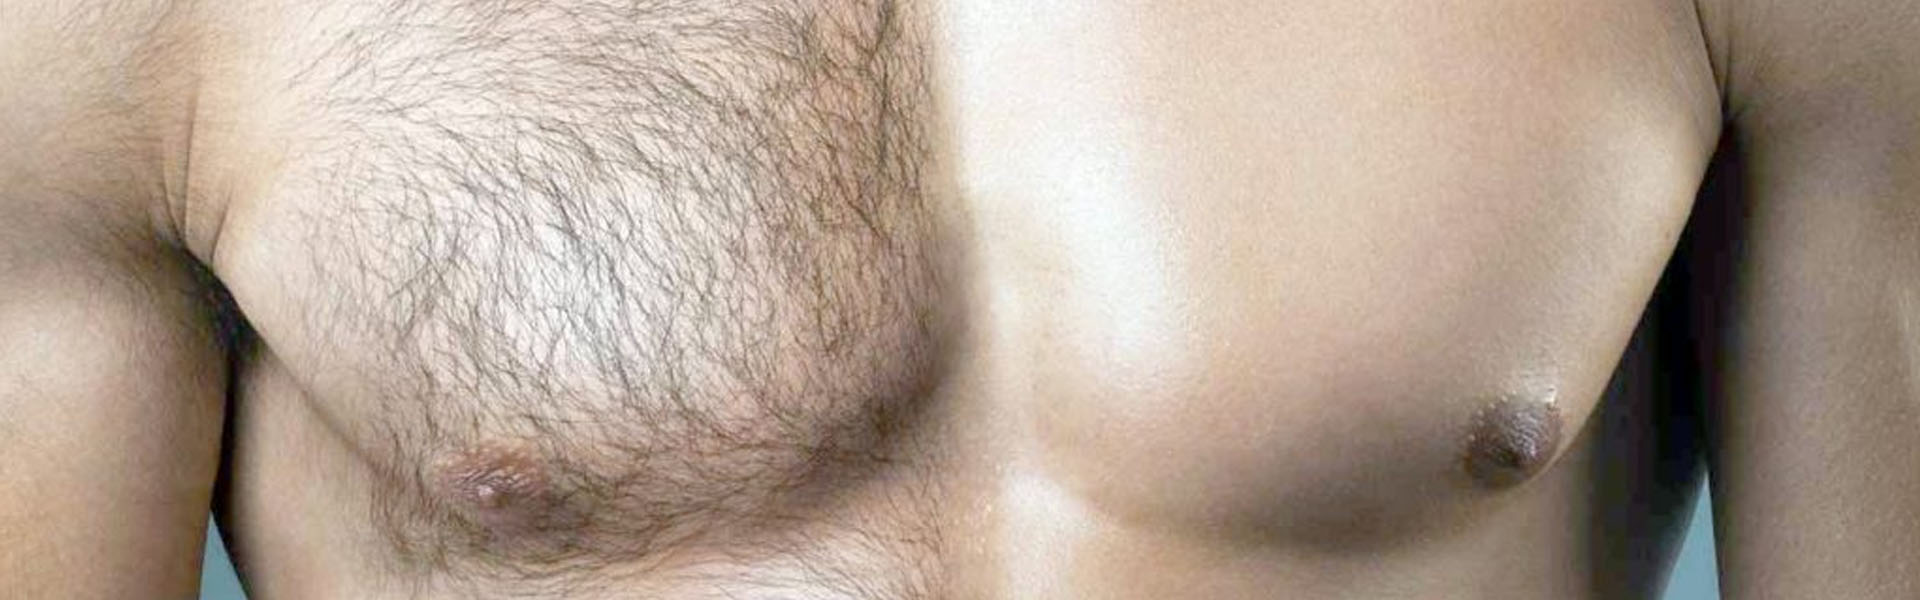 madhuspa, blog, depilacao masculina,